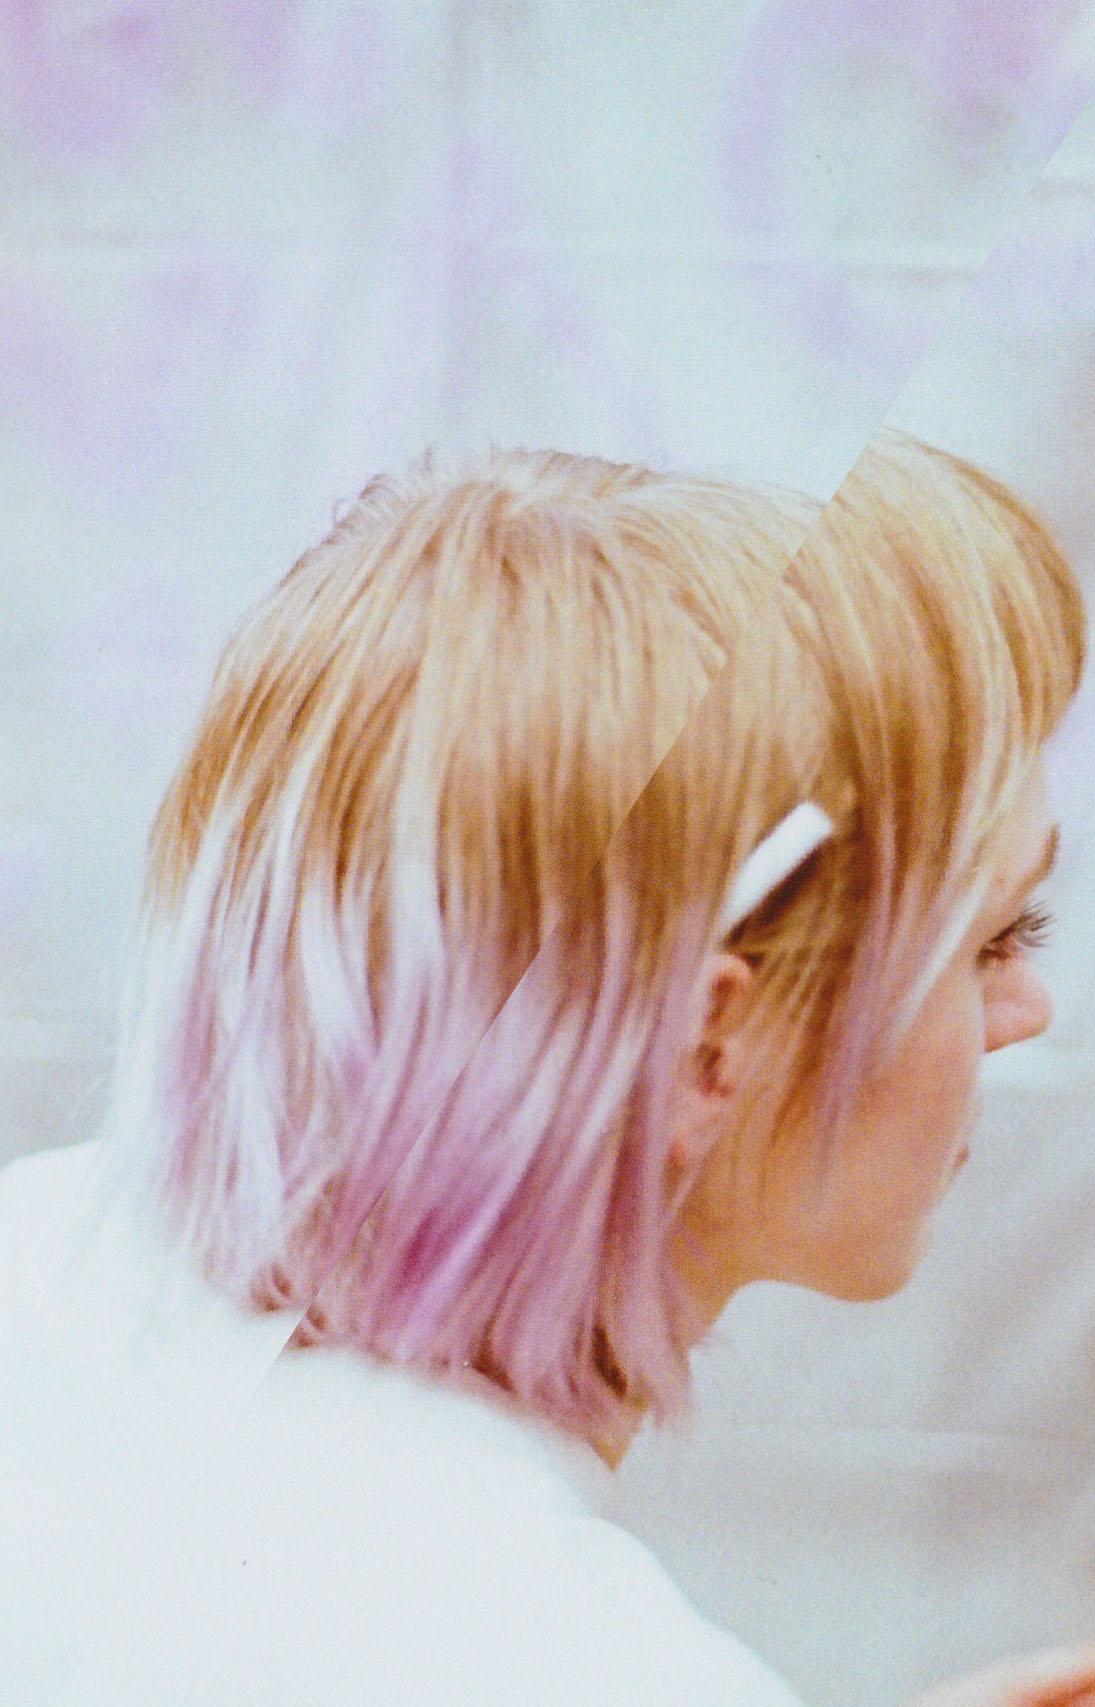 Impassive aesthetics Lou's frigid vignette of color